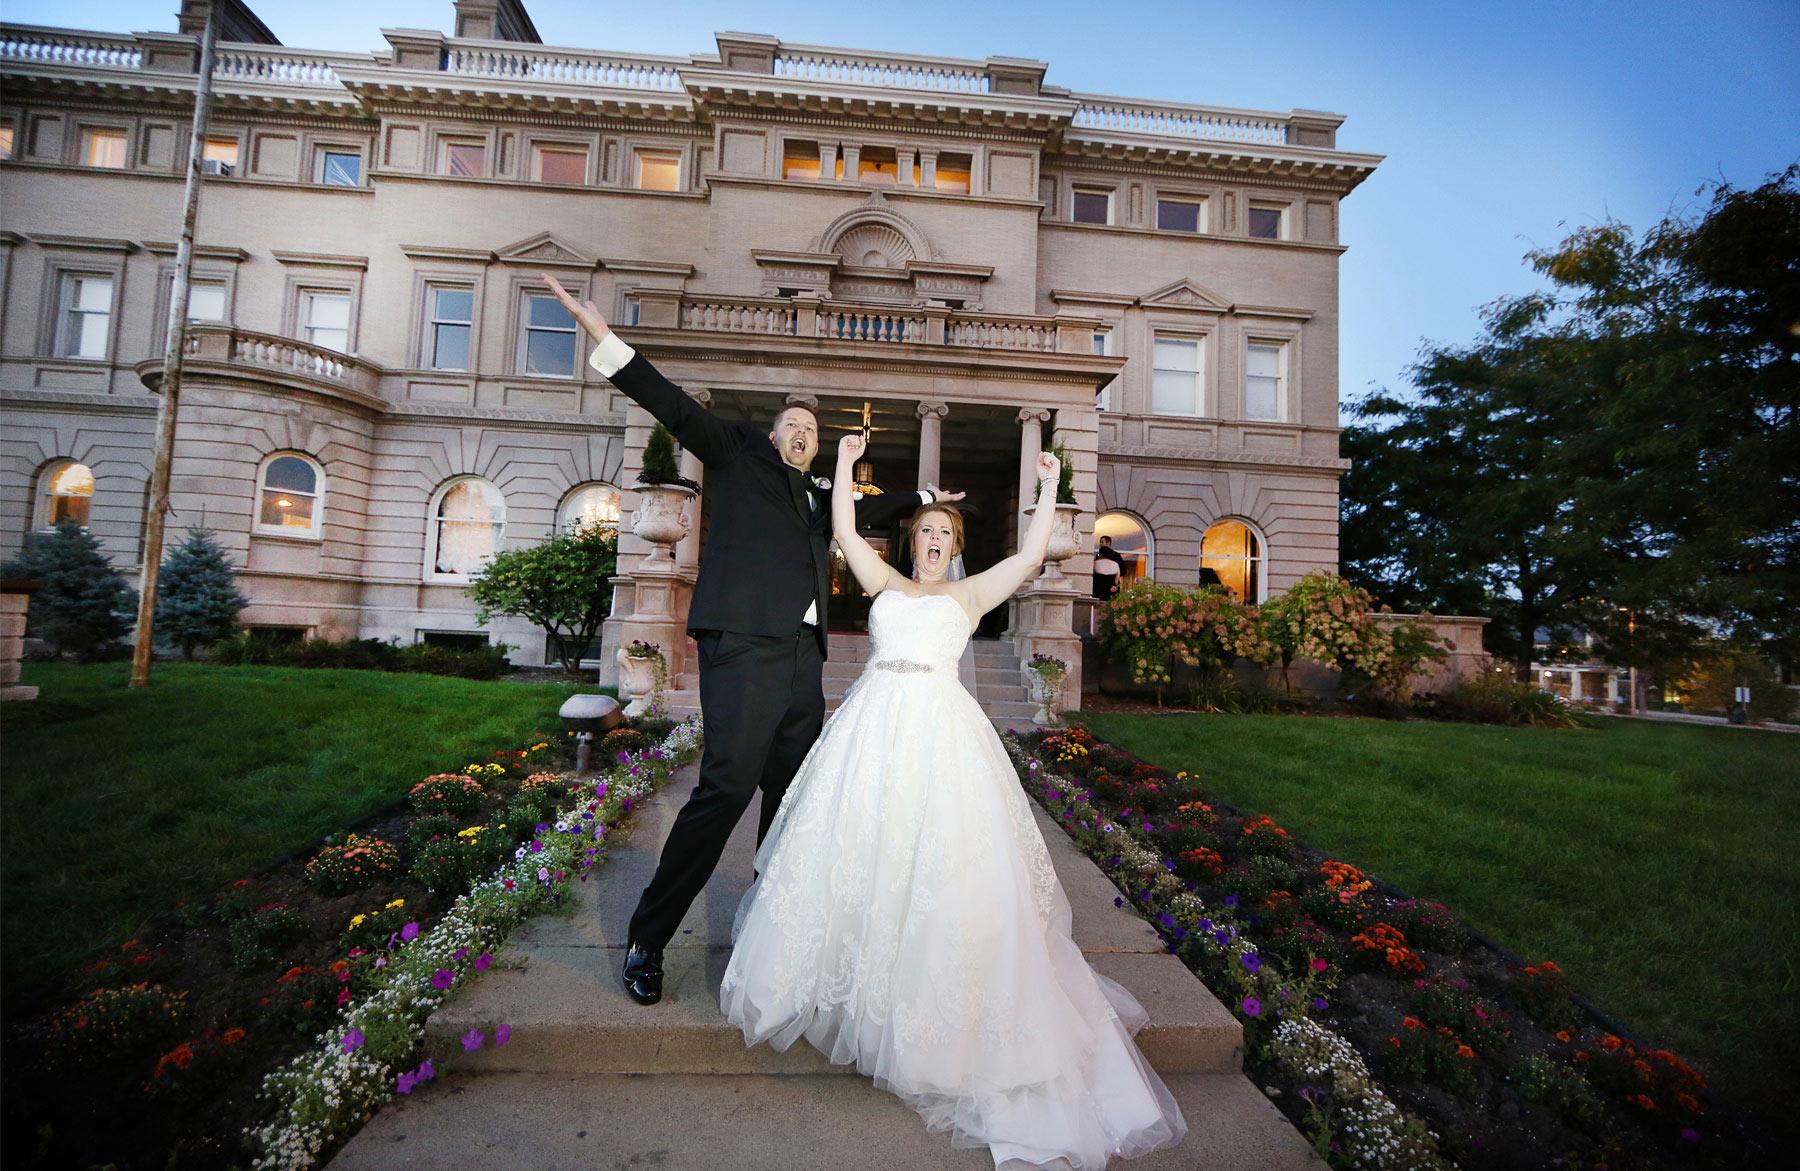 16-Minneapolis-Minnesota-Wedding-Photography-by-Vick-Photography-Semple-Mansion-Celebration-Caitlin-&-Derrick.jpg